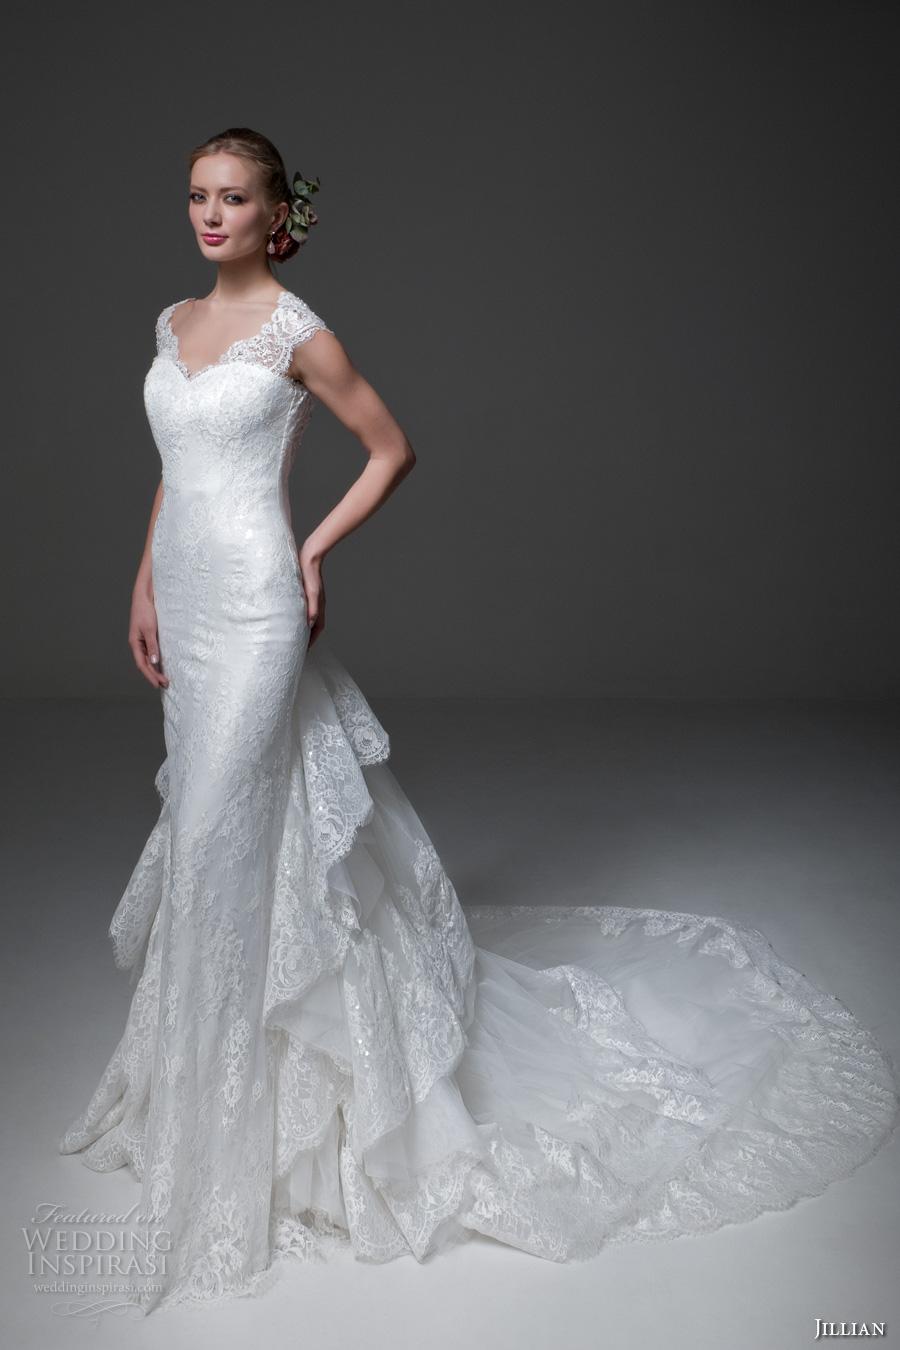 jillian 2017 bridal cap sleeves sweetheart neckline full embellishment elegant sheath wedding dress low back tiered long train (miranda) mv